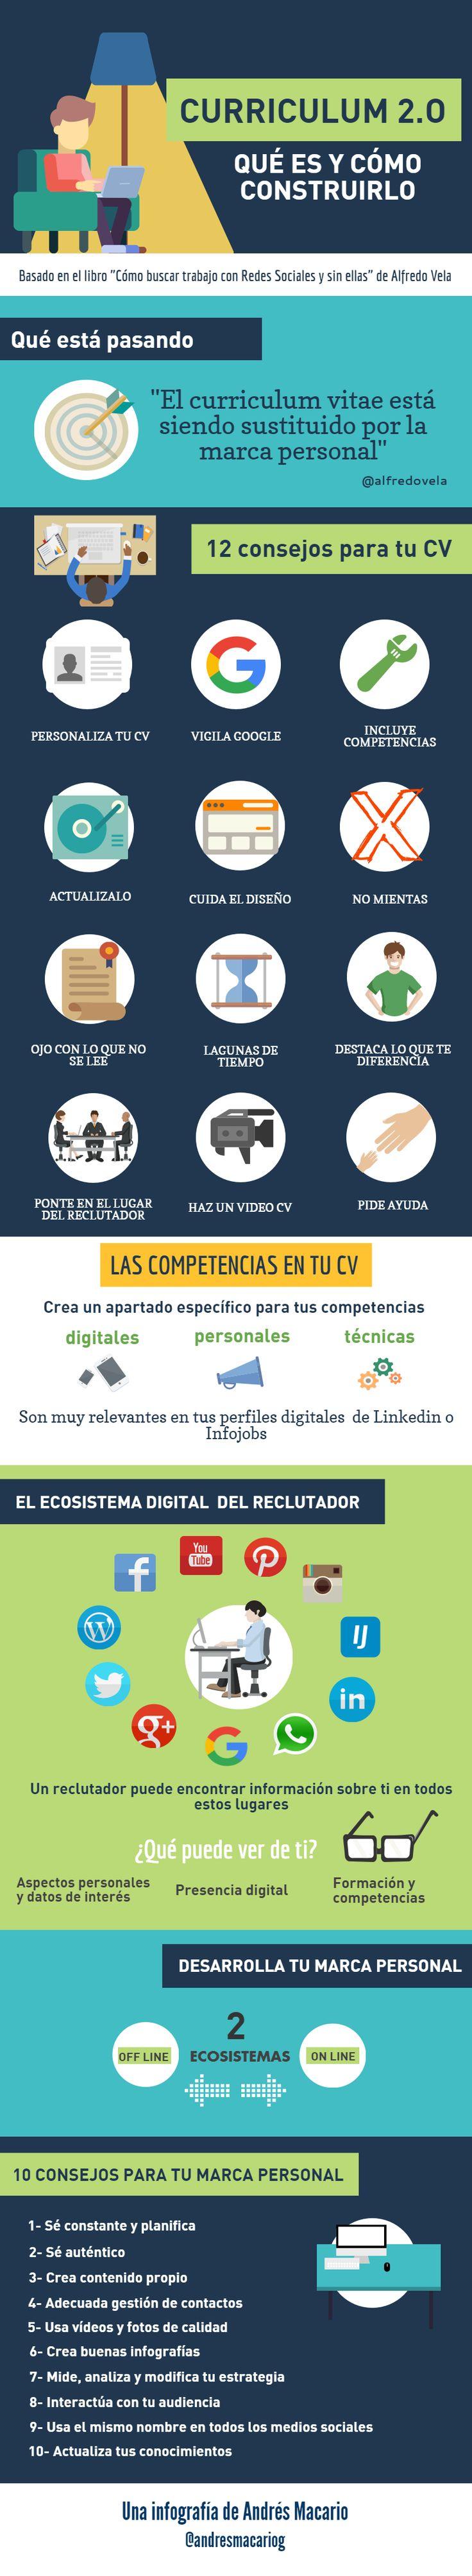 Como hacer un Curriculum 2.0 #infografia